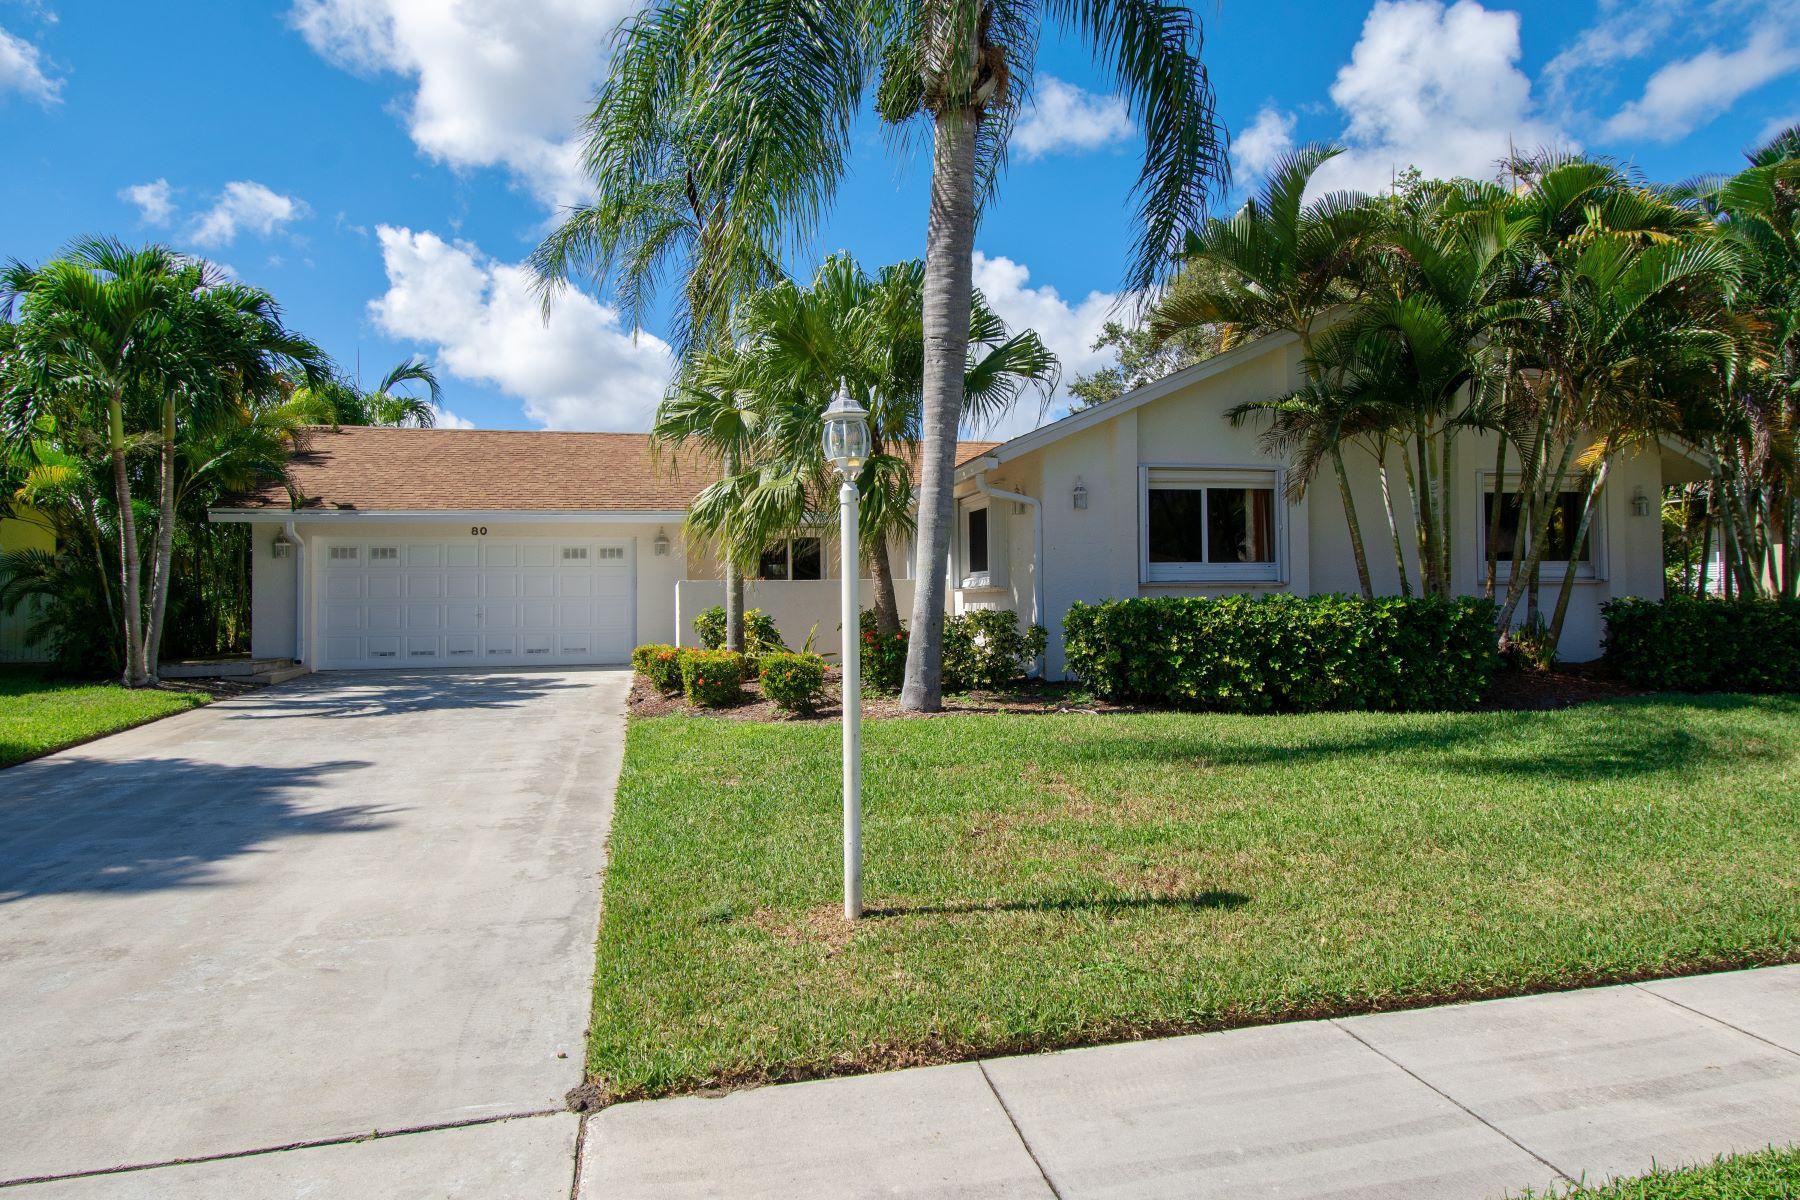 Eensgezinswoning voor Verkoop op 80 Vista Del Rio 80 Vista Del Rio Boynton Beach, Florida 33426 Verenigde Staten